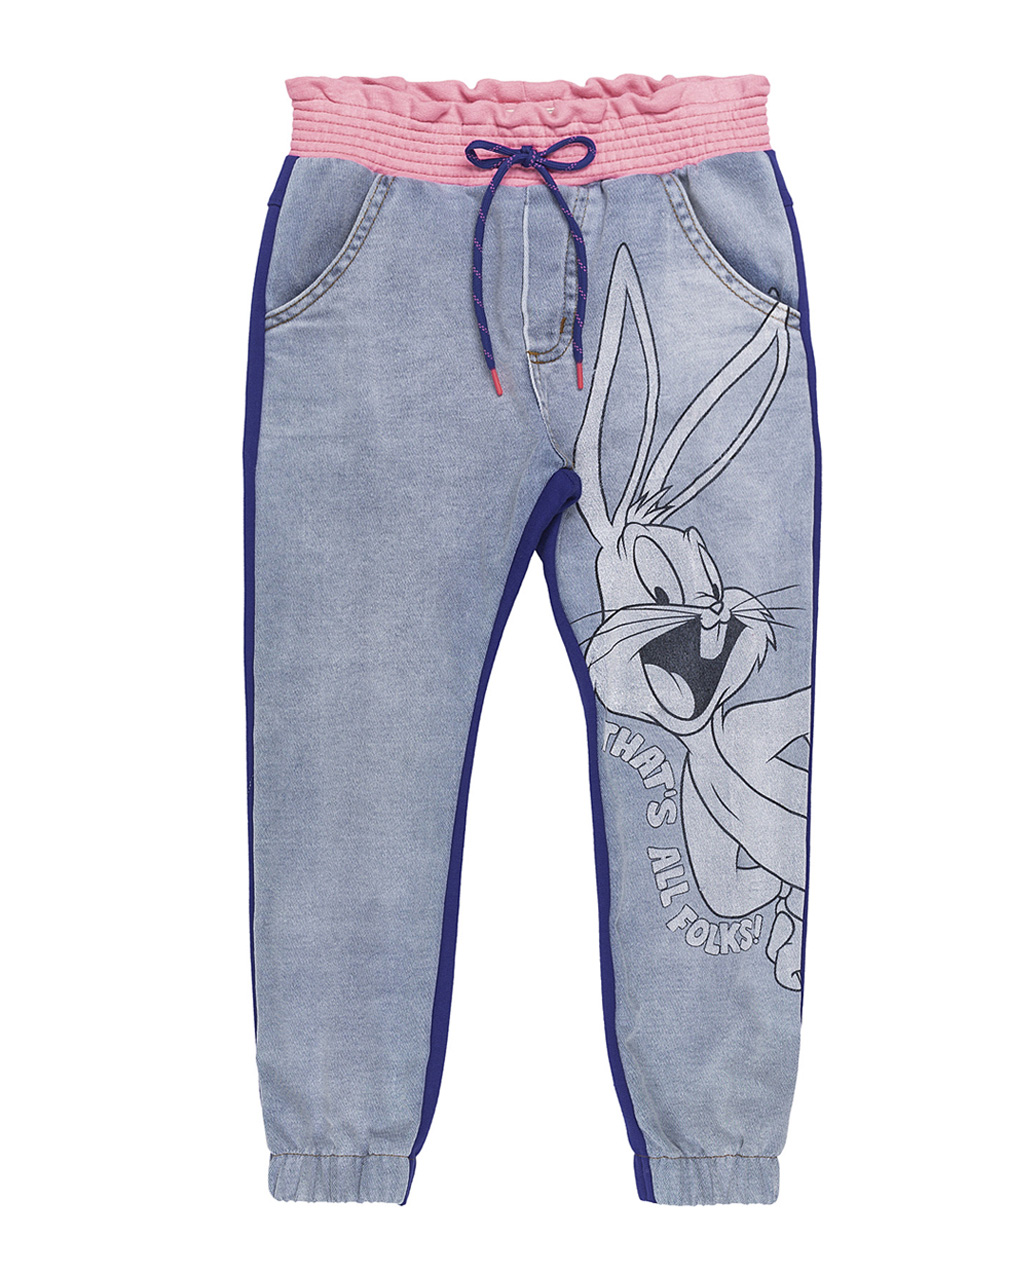 Calça Infantil Jeans Estampa Pernalonga Licenciada Animê